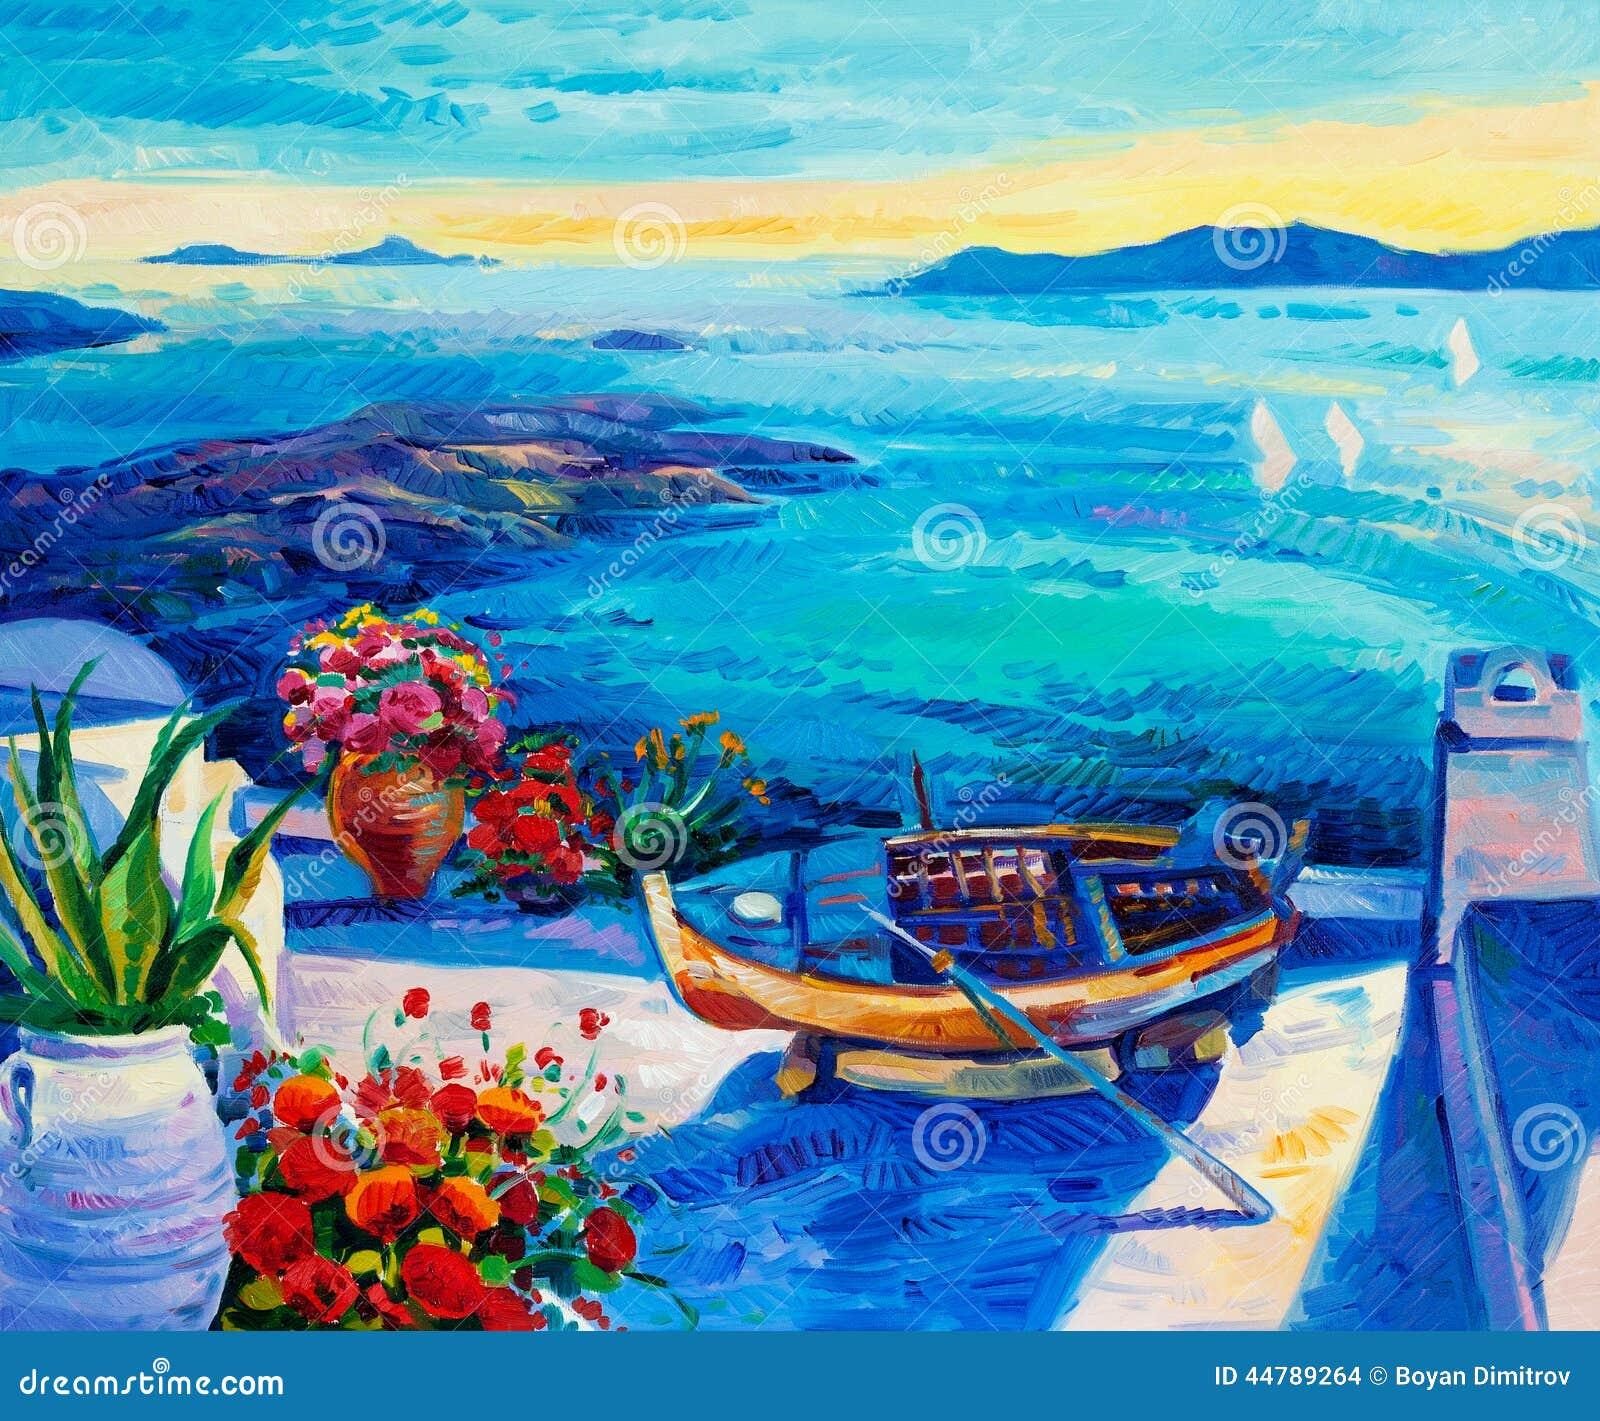 Acrylic Paintings Of Santorini Island